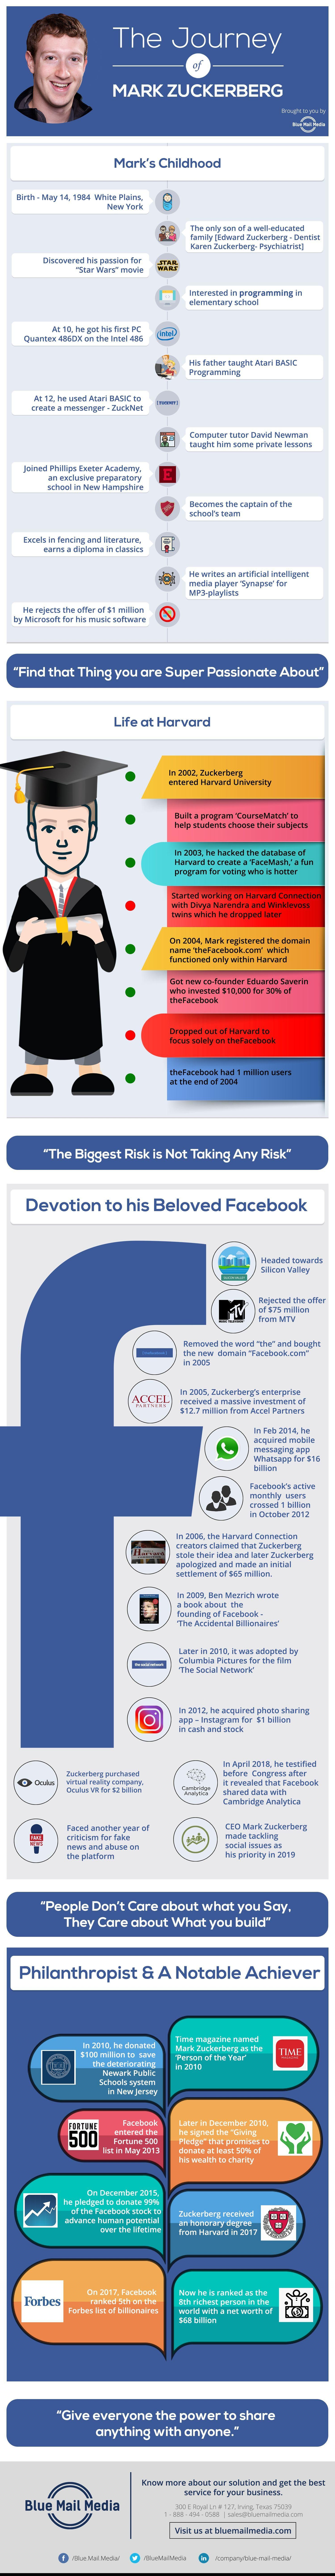 The Unusual but Redoubtable Journey of Mark Zuckerberg - Infographic